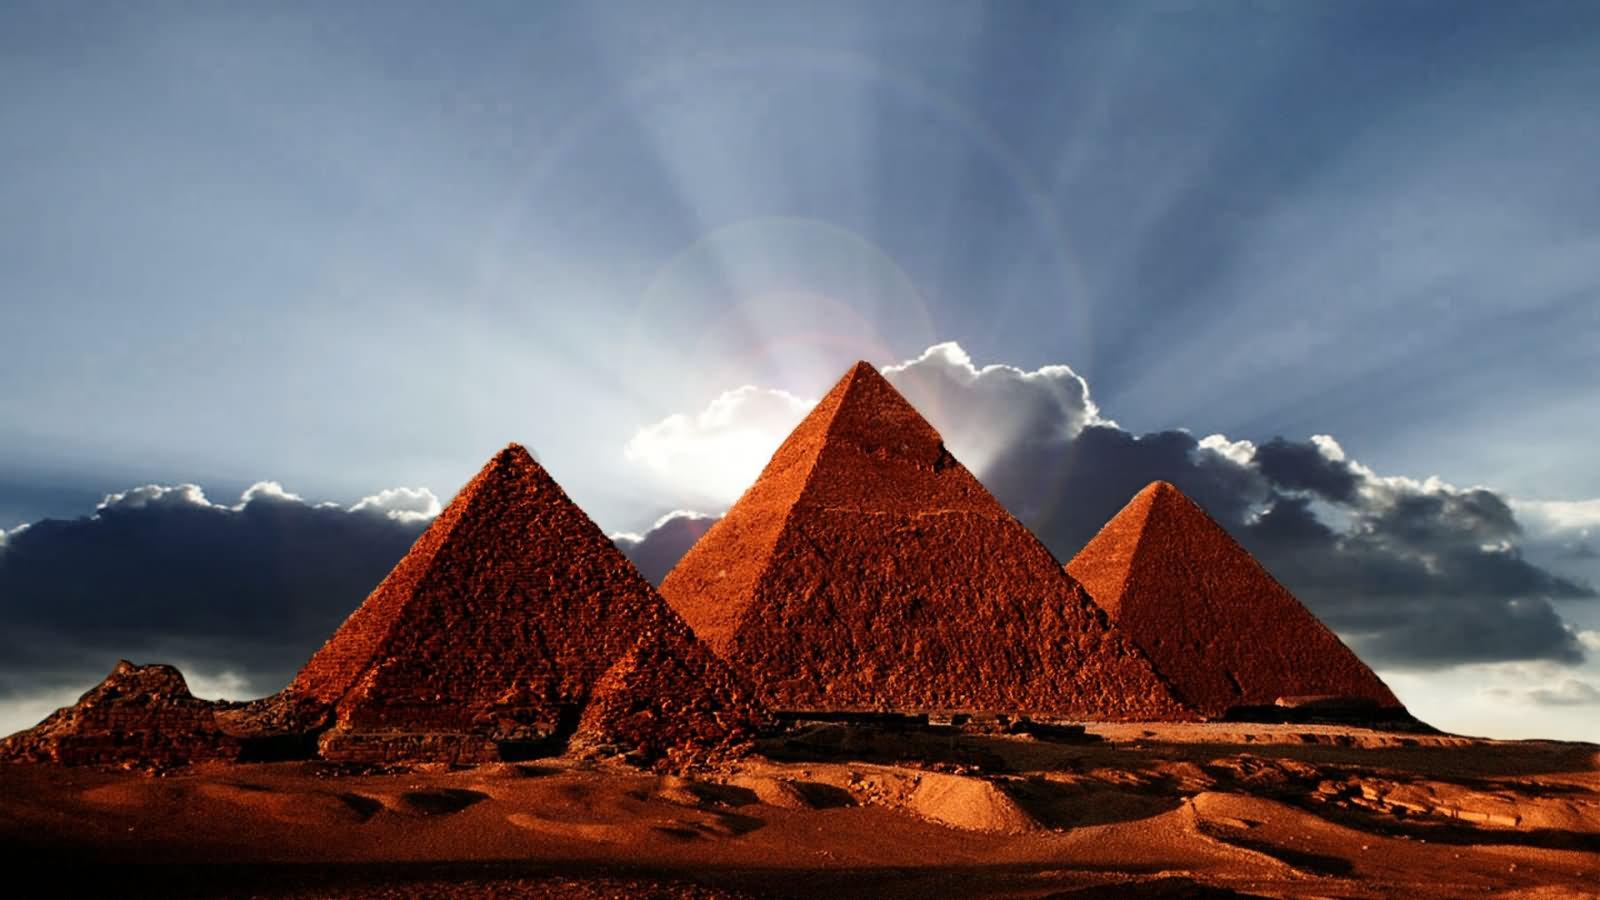 Egyptian Pyramids Looks Beautiful During Sunset